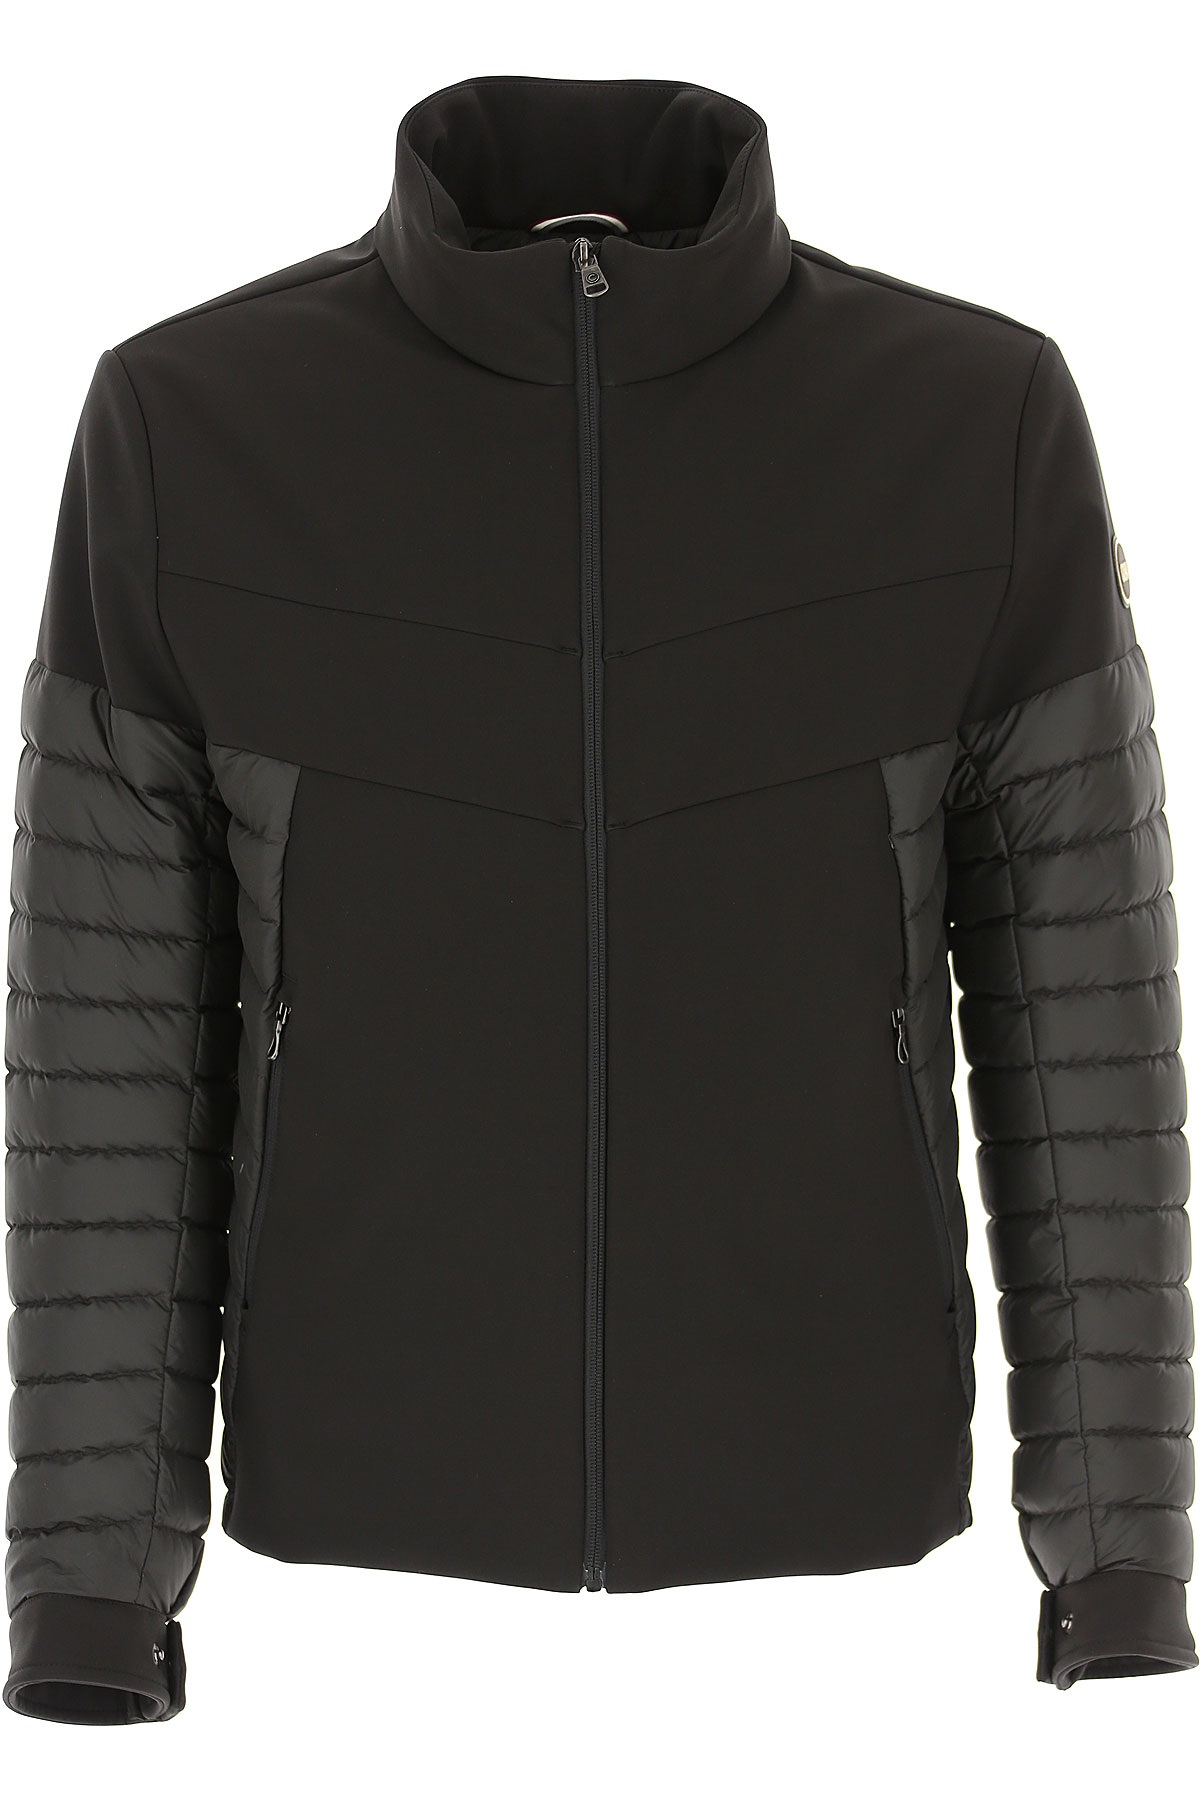 Colmar Down Jacket for Men, Puffer Ski Jacket On Sale, polyester, 2019, L M S XL XXL XXXL